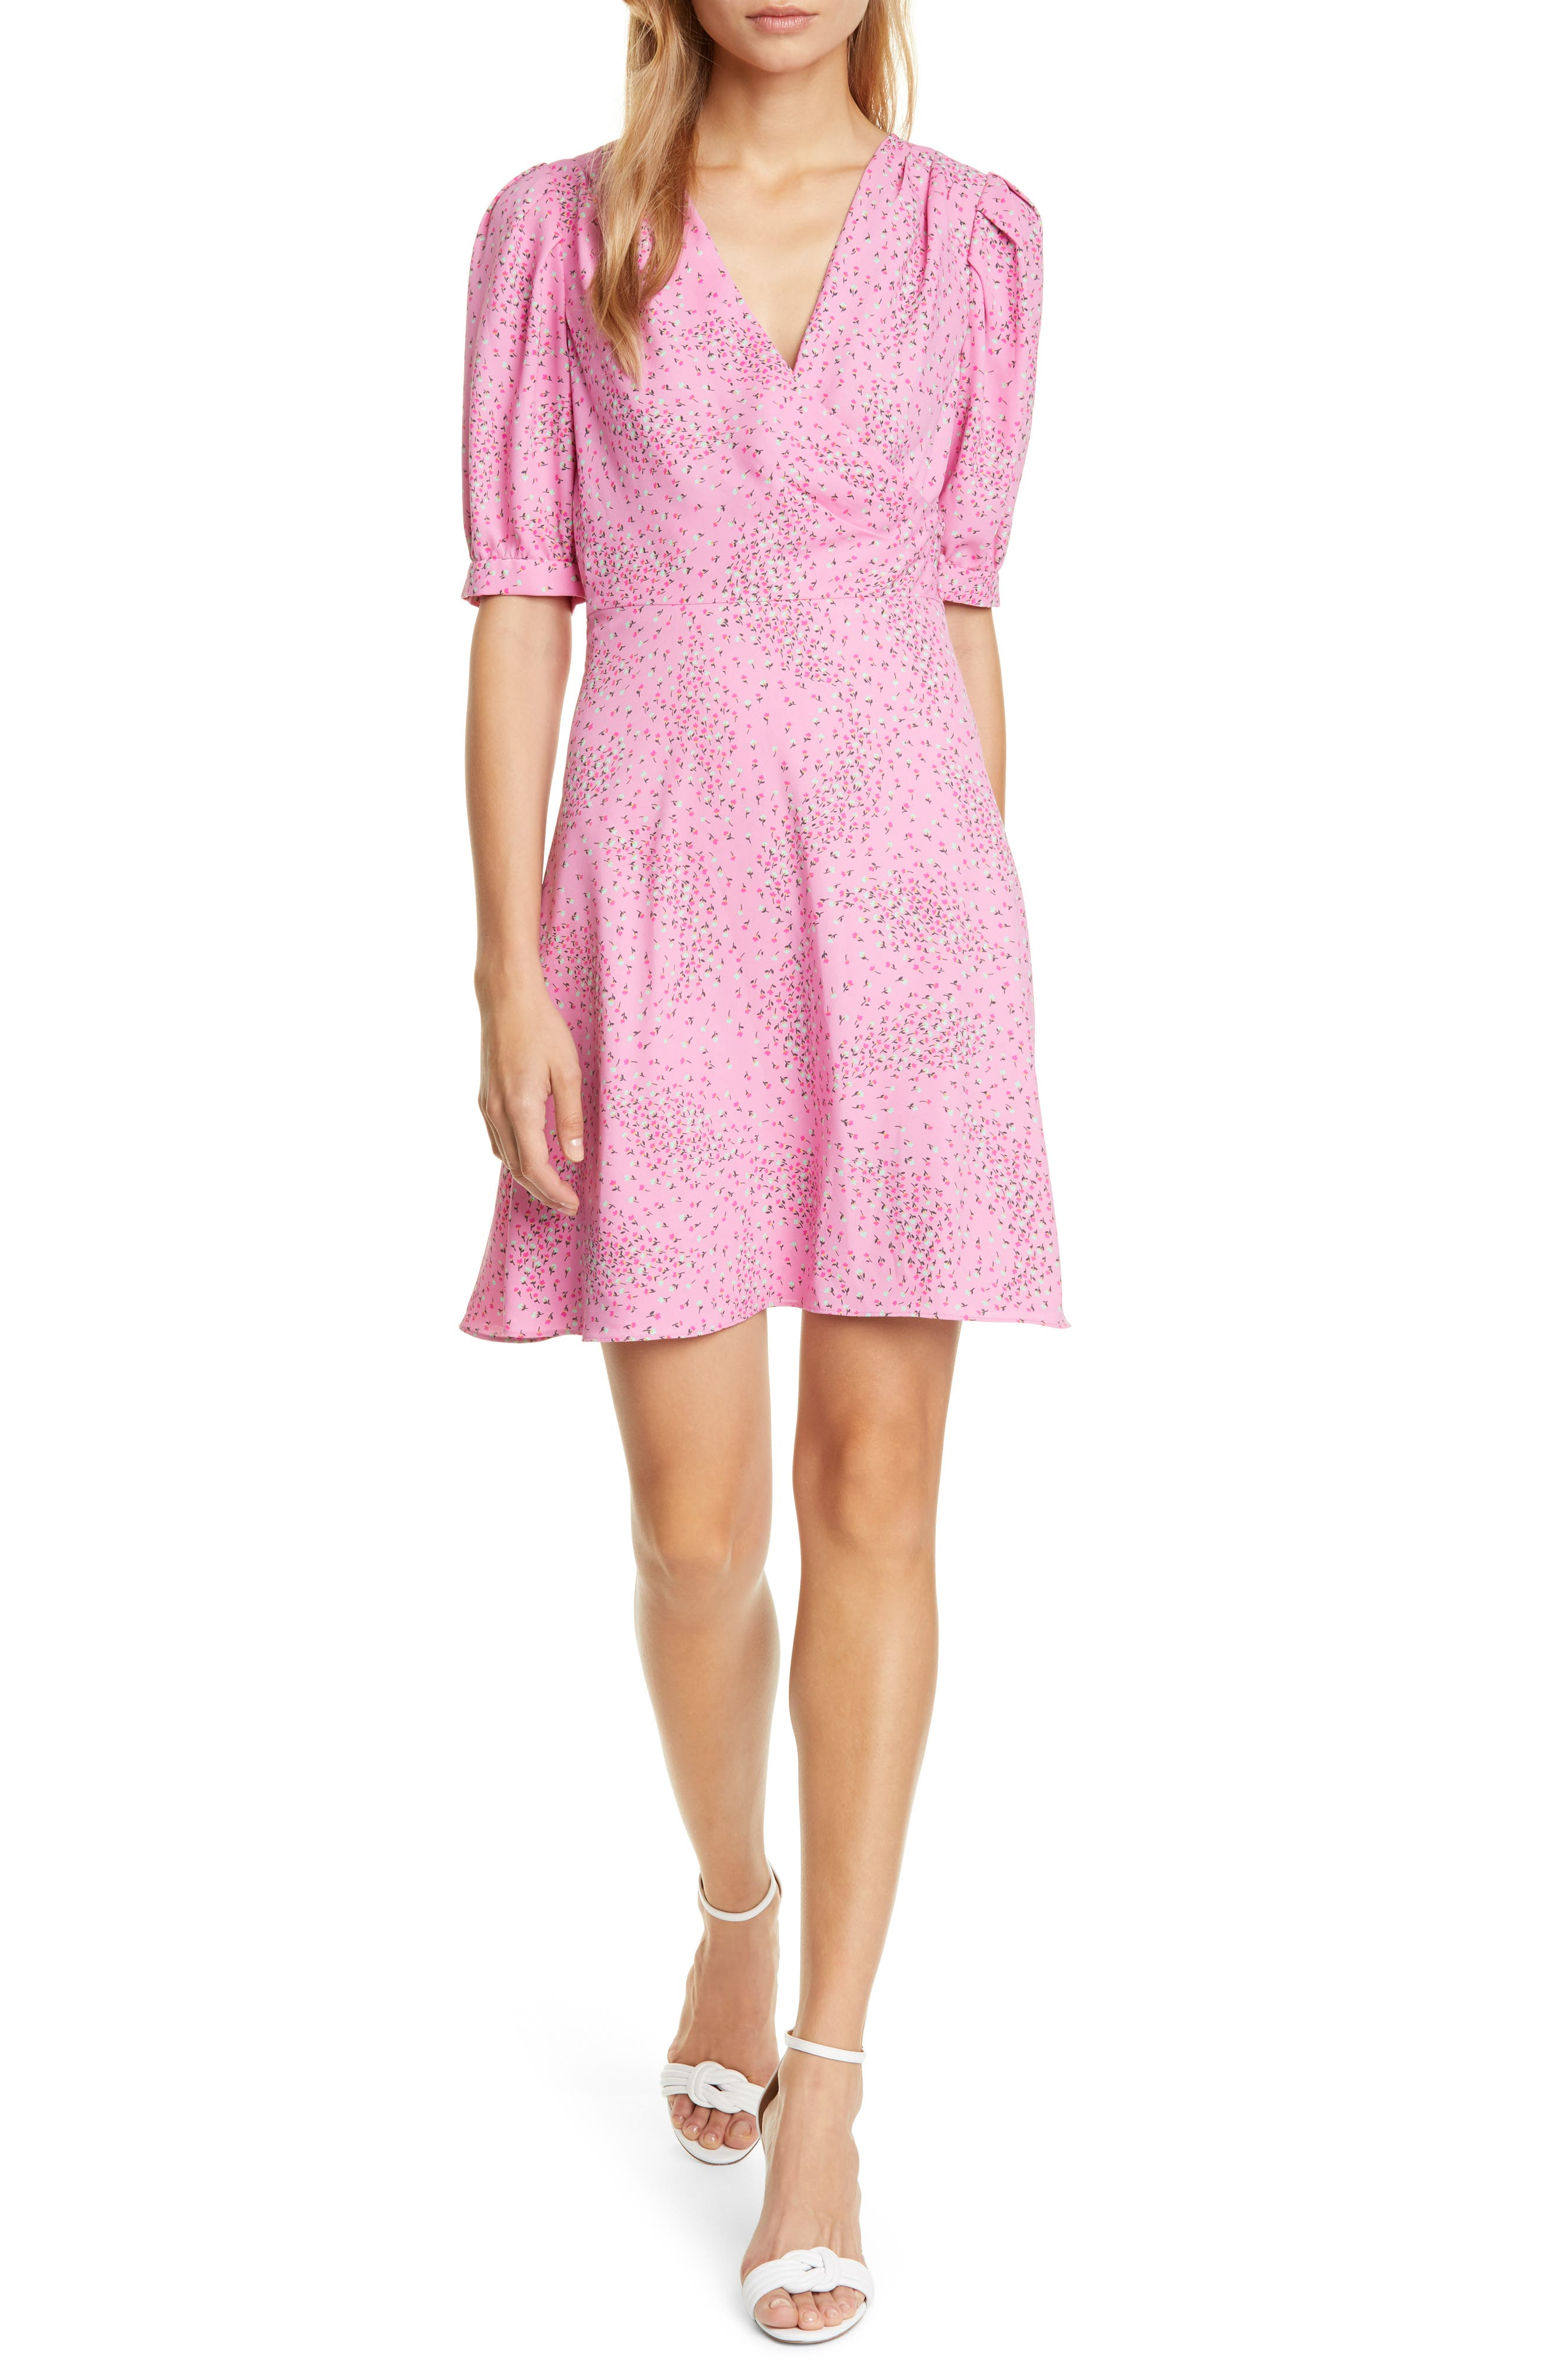 Kate Spade New York Dresses meadow wrap dress